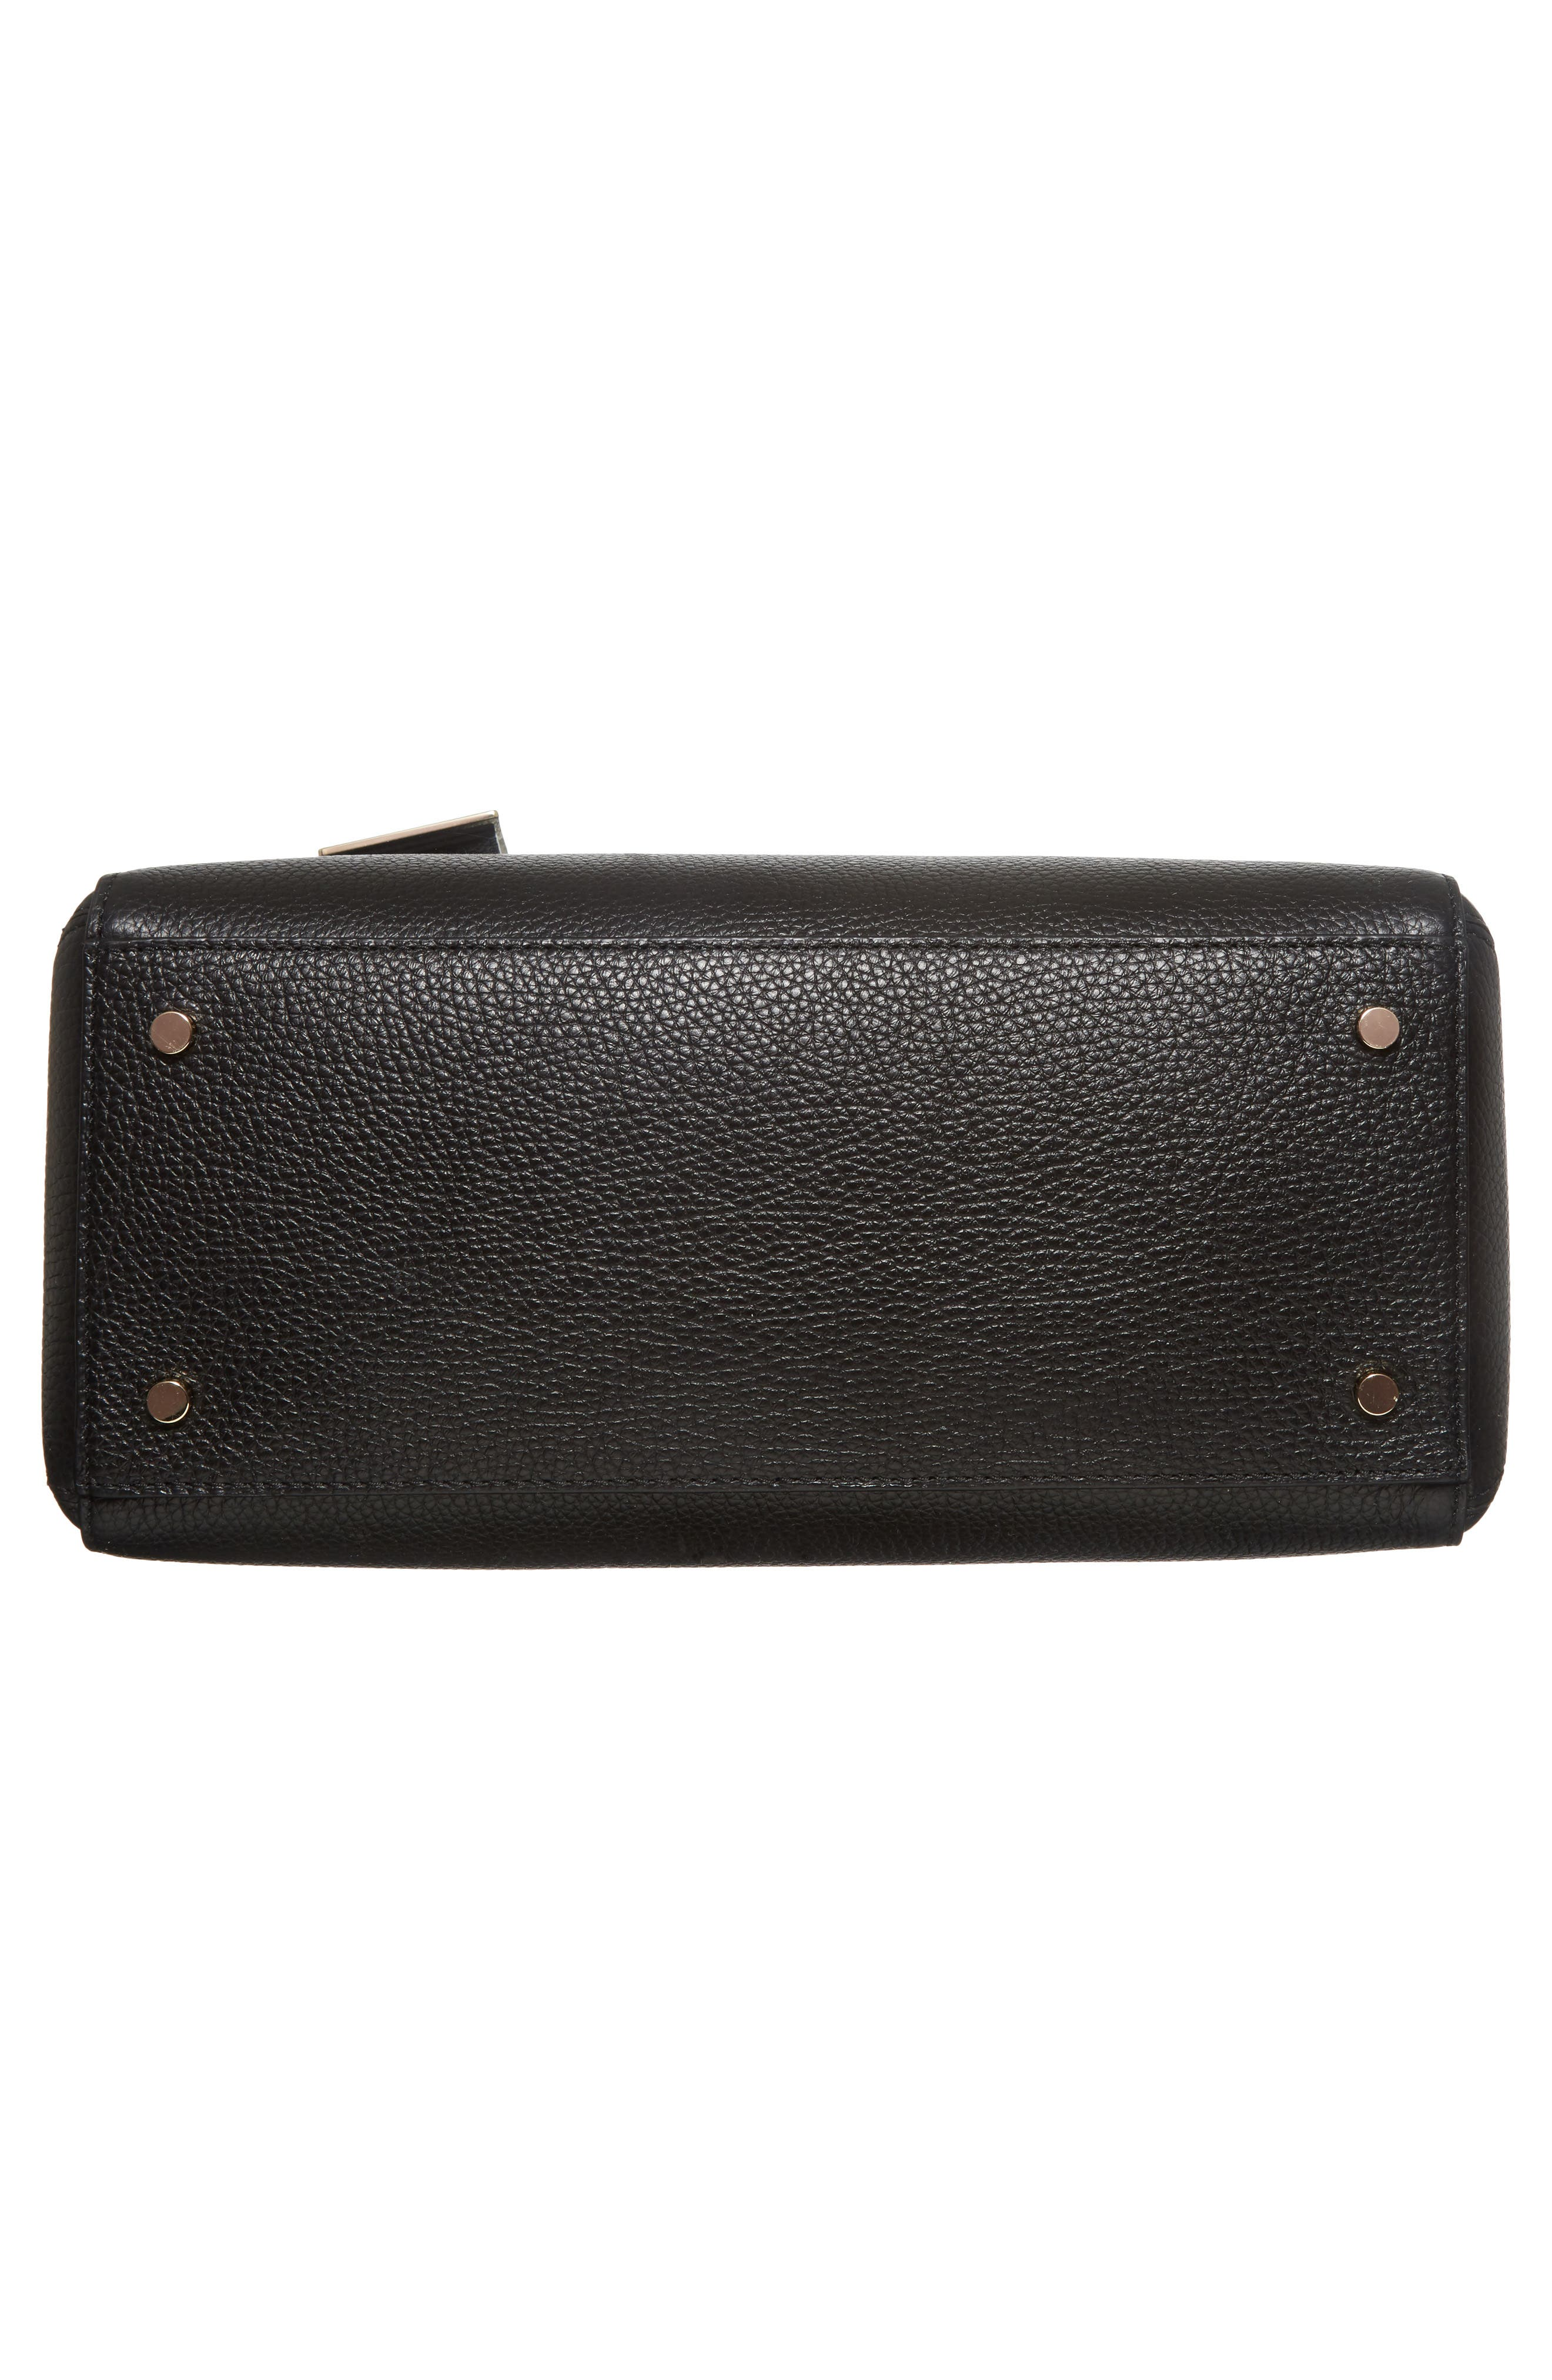 mega madison knollwood drive - lane leather satchel,                             Alternate thumbnail 6, color,                             001